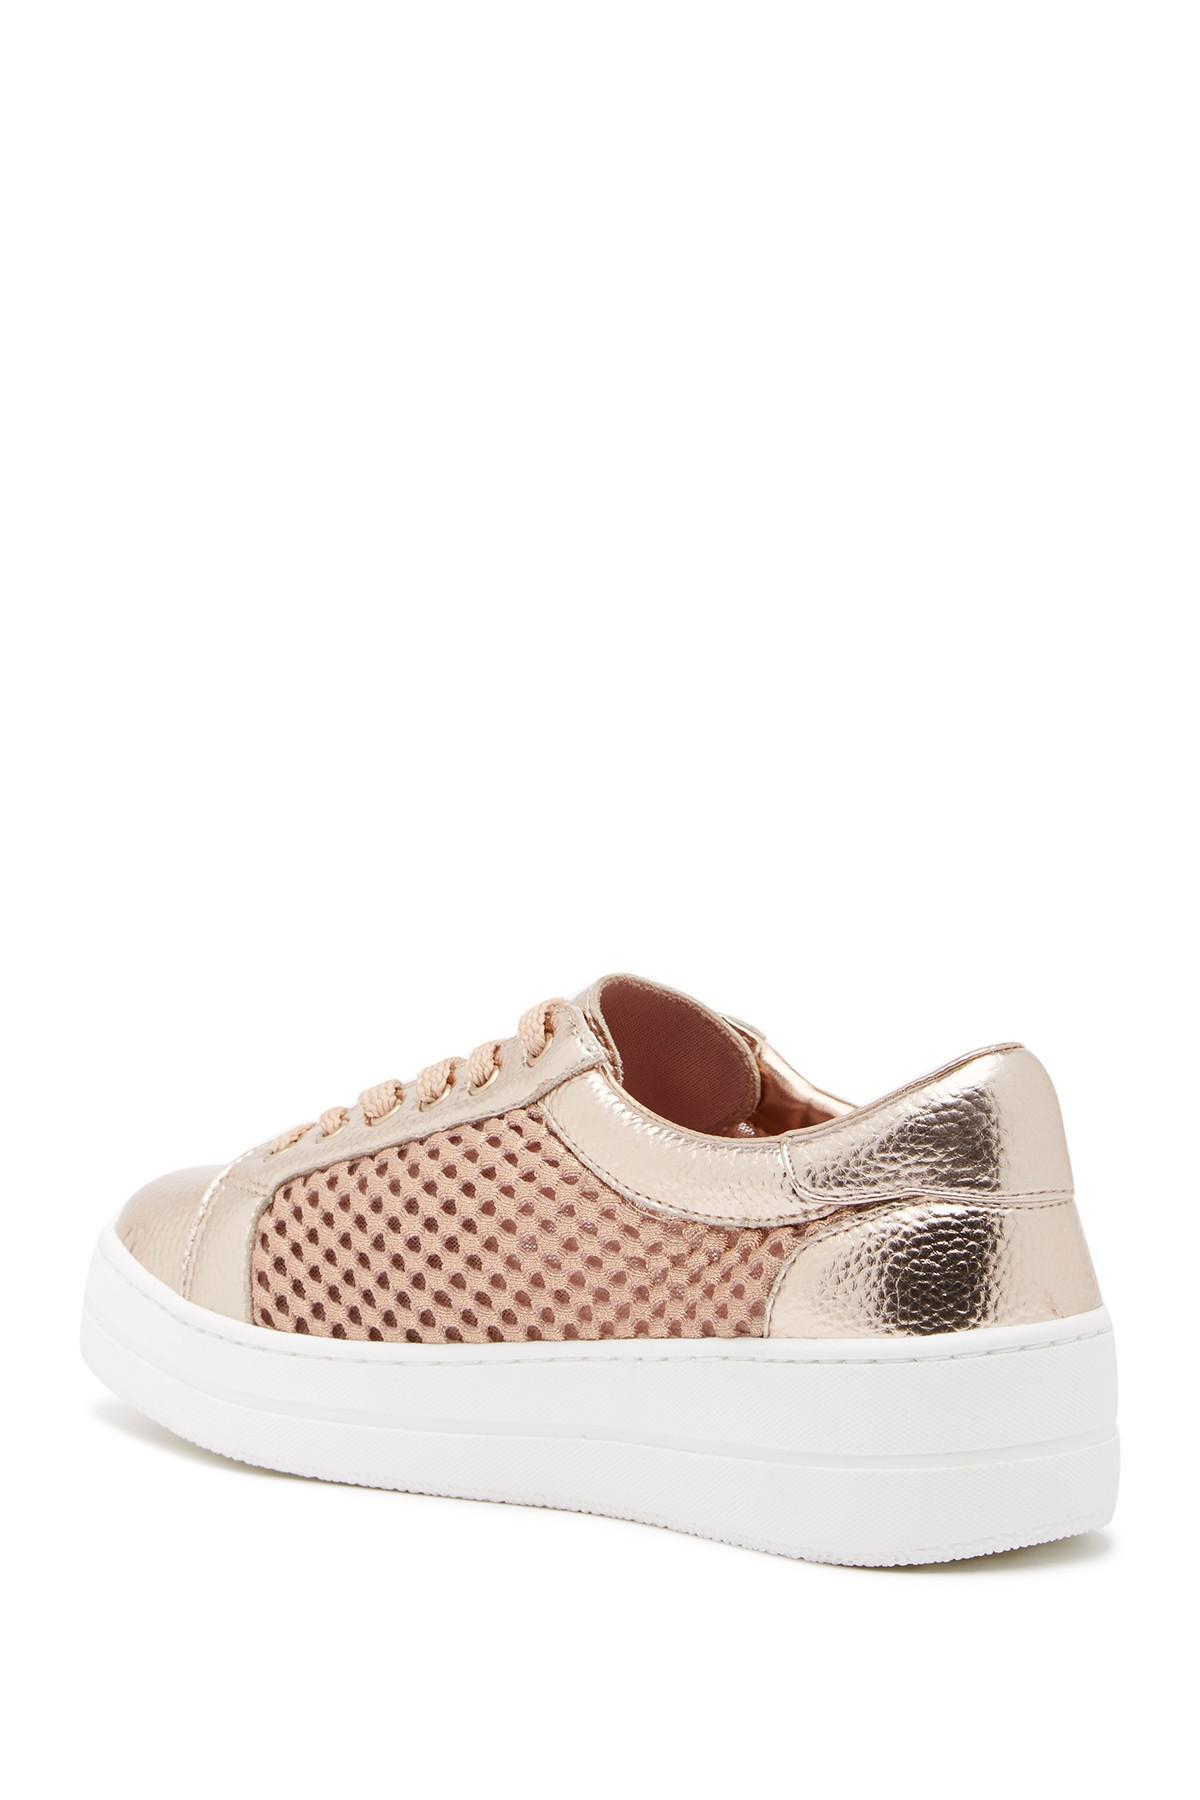 ca10b836634 Lyst - Steven by Steve Madden Napper Platform Sneaker in Pink